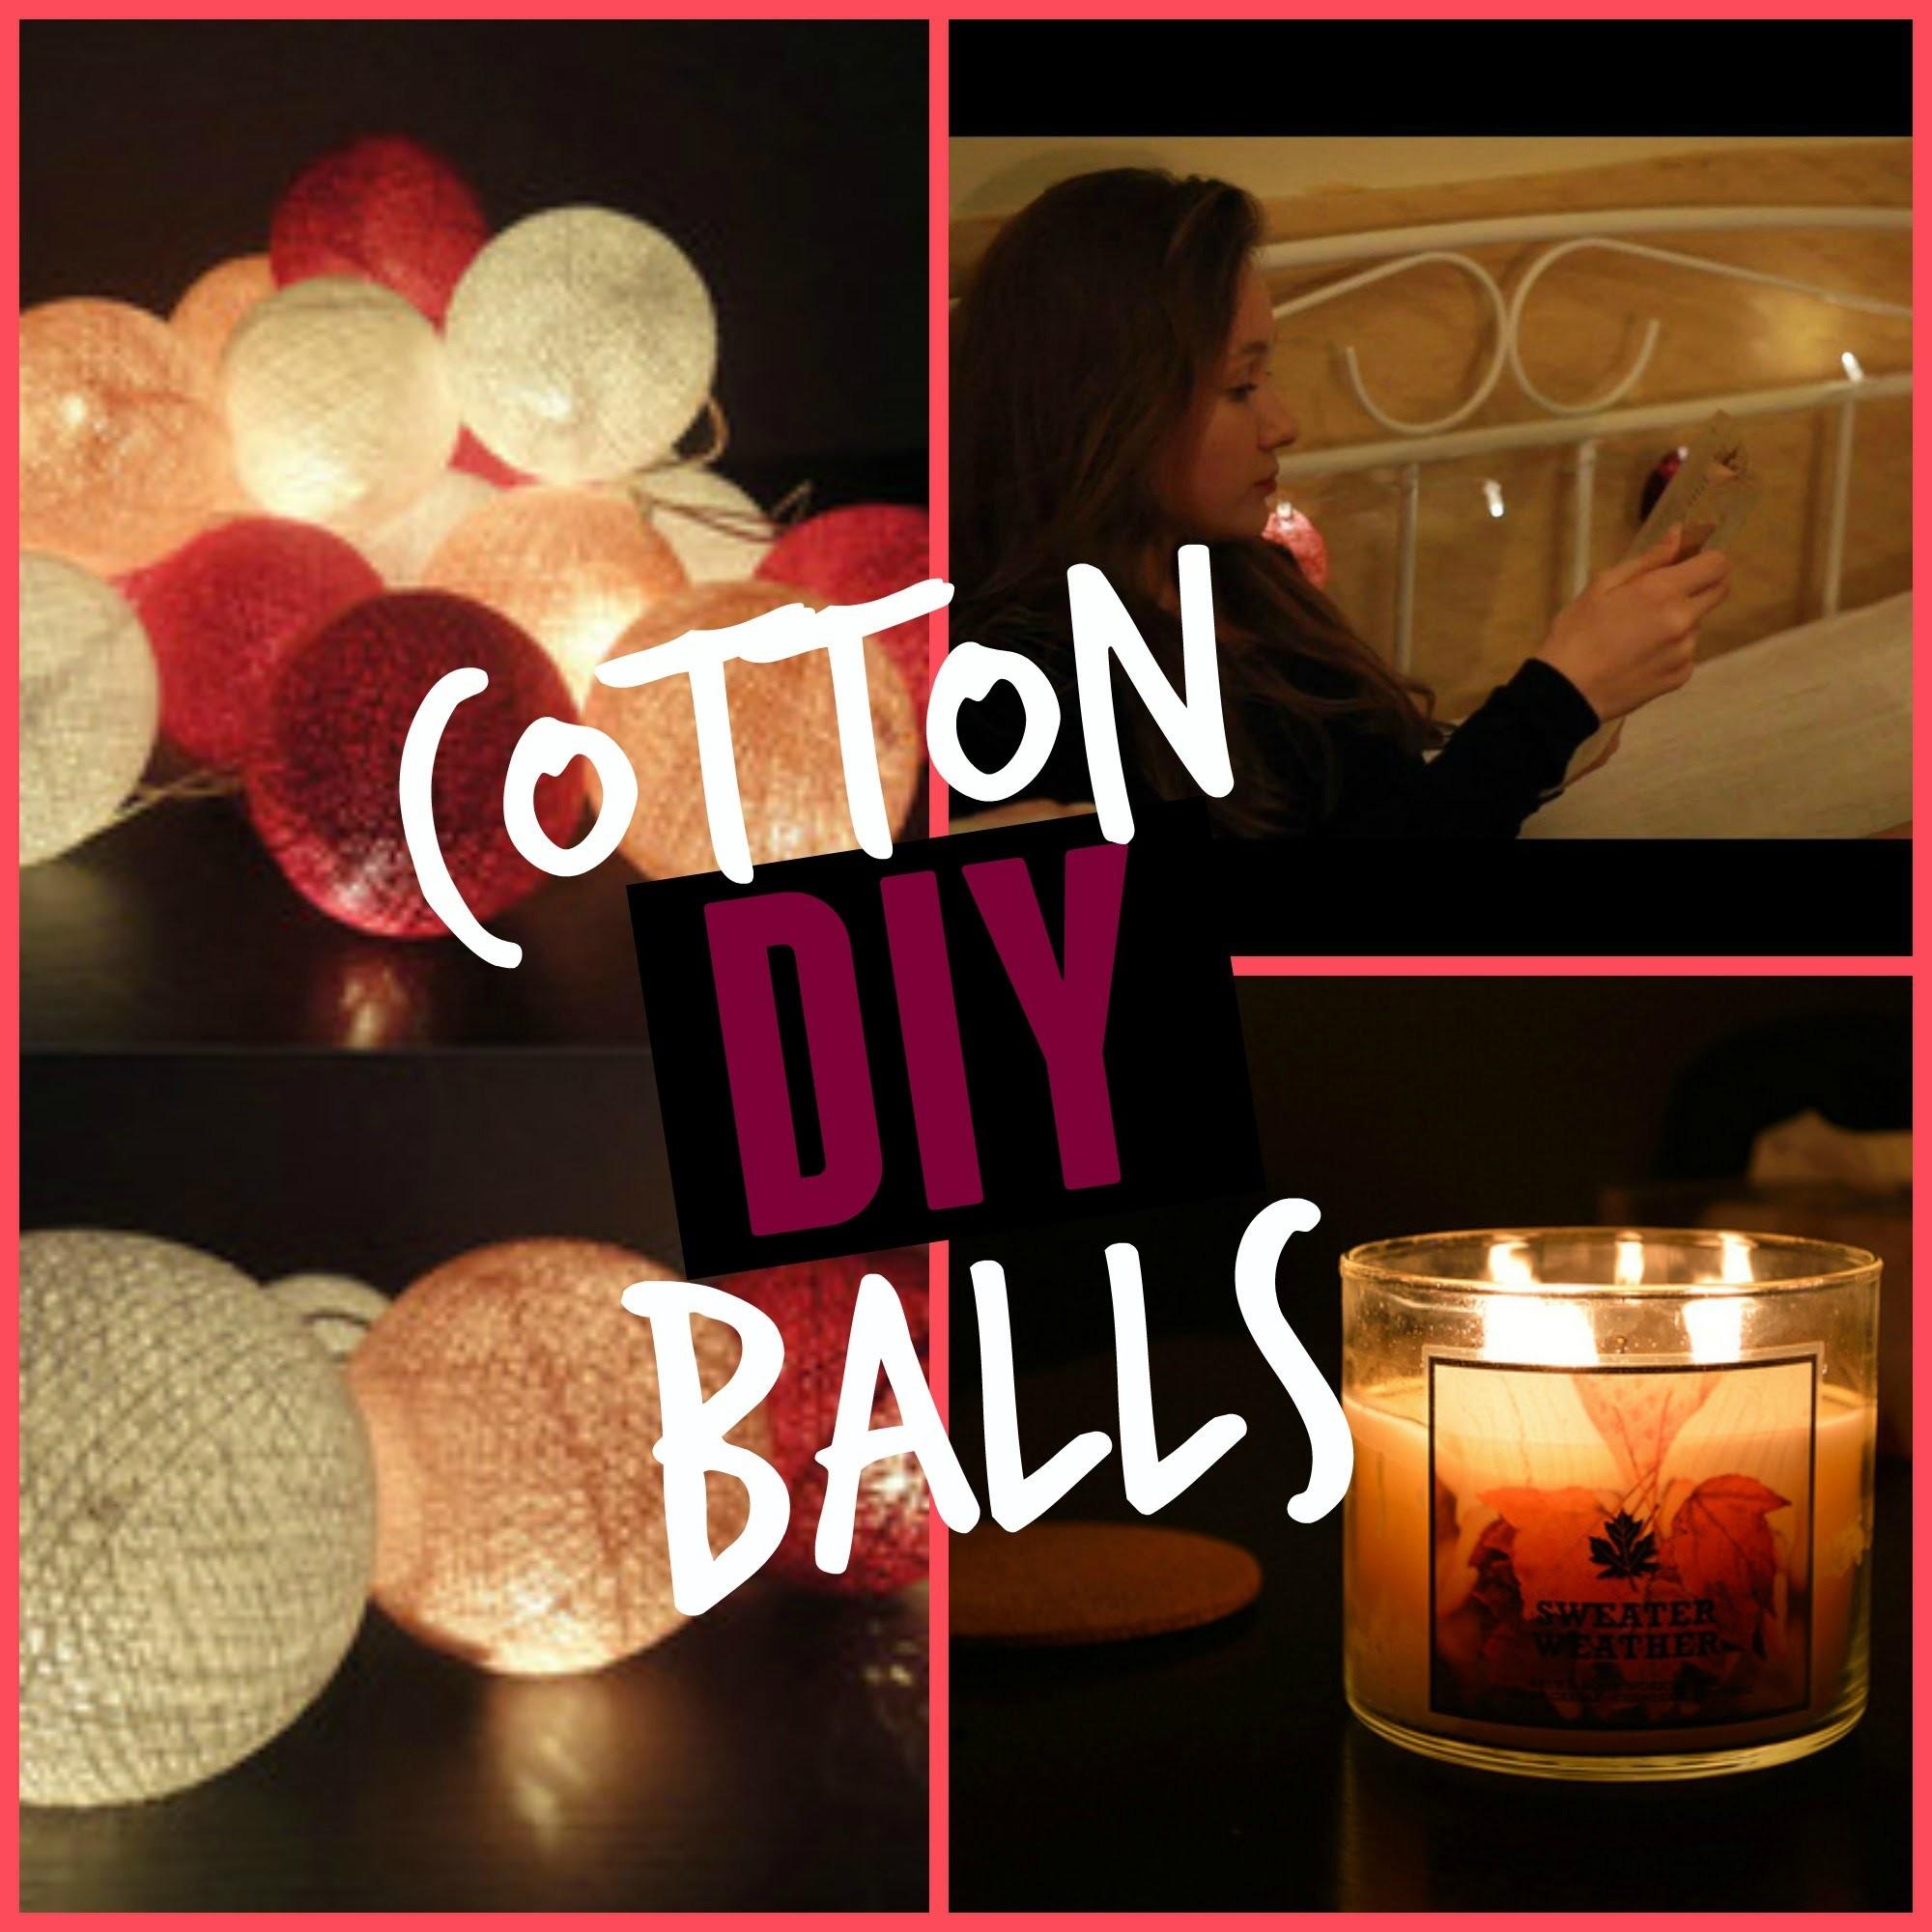 Cotton Ball Lights DIY ♡ Zrób to sam